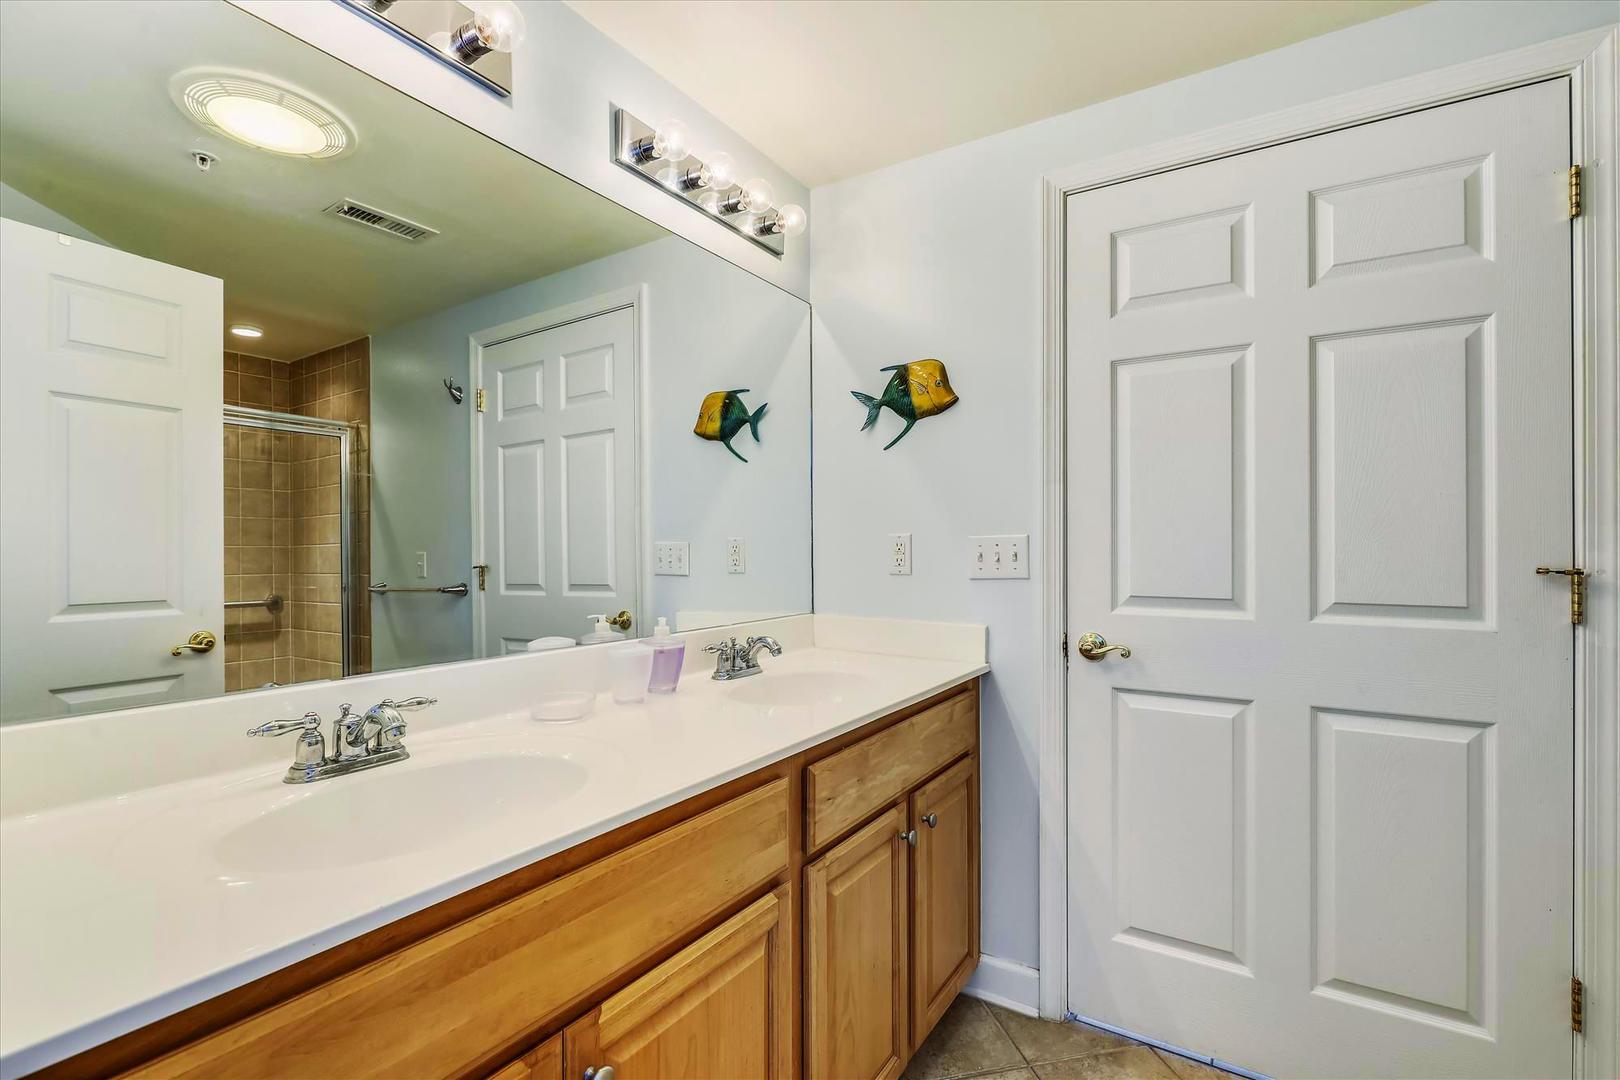 Bahia Vista I 208 - Bathroom 2